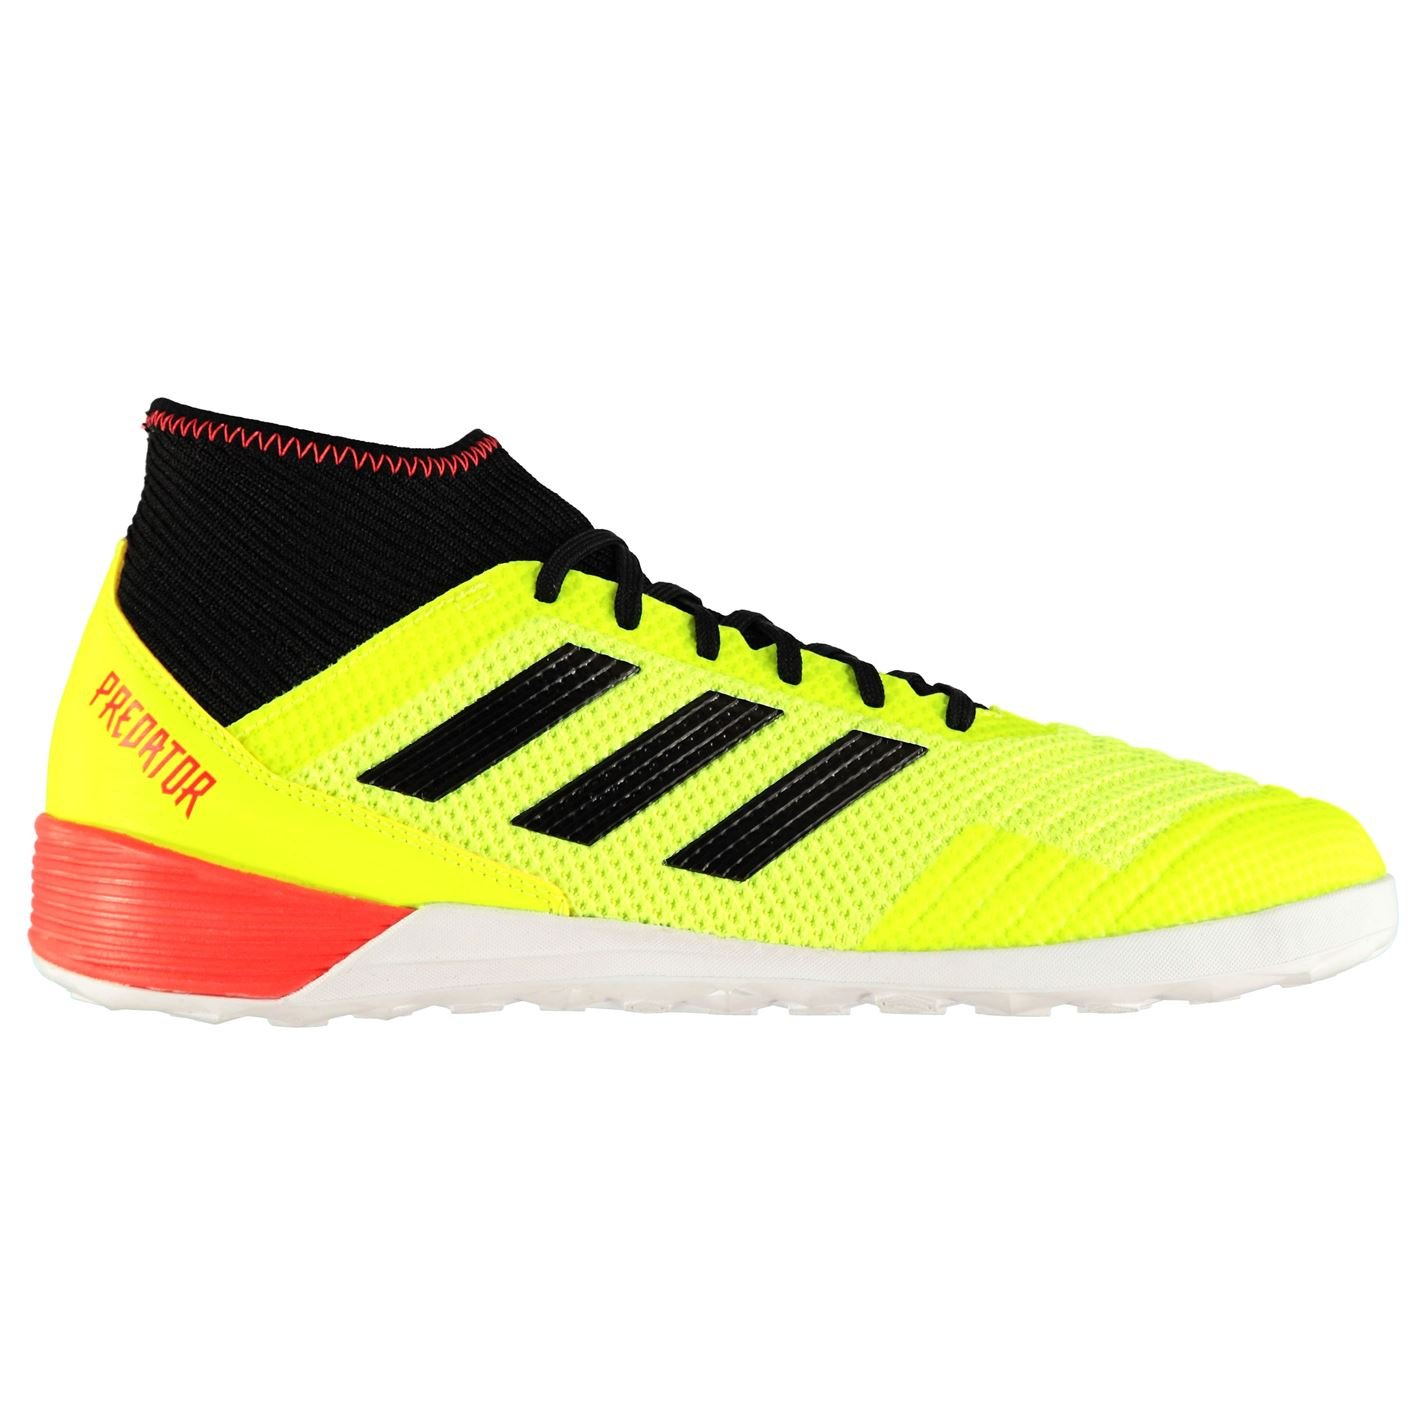 Gelb (Amasol Negbás Rojsol 000) adidas Herren Protator Tango 18.3 in Futsalschuhe